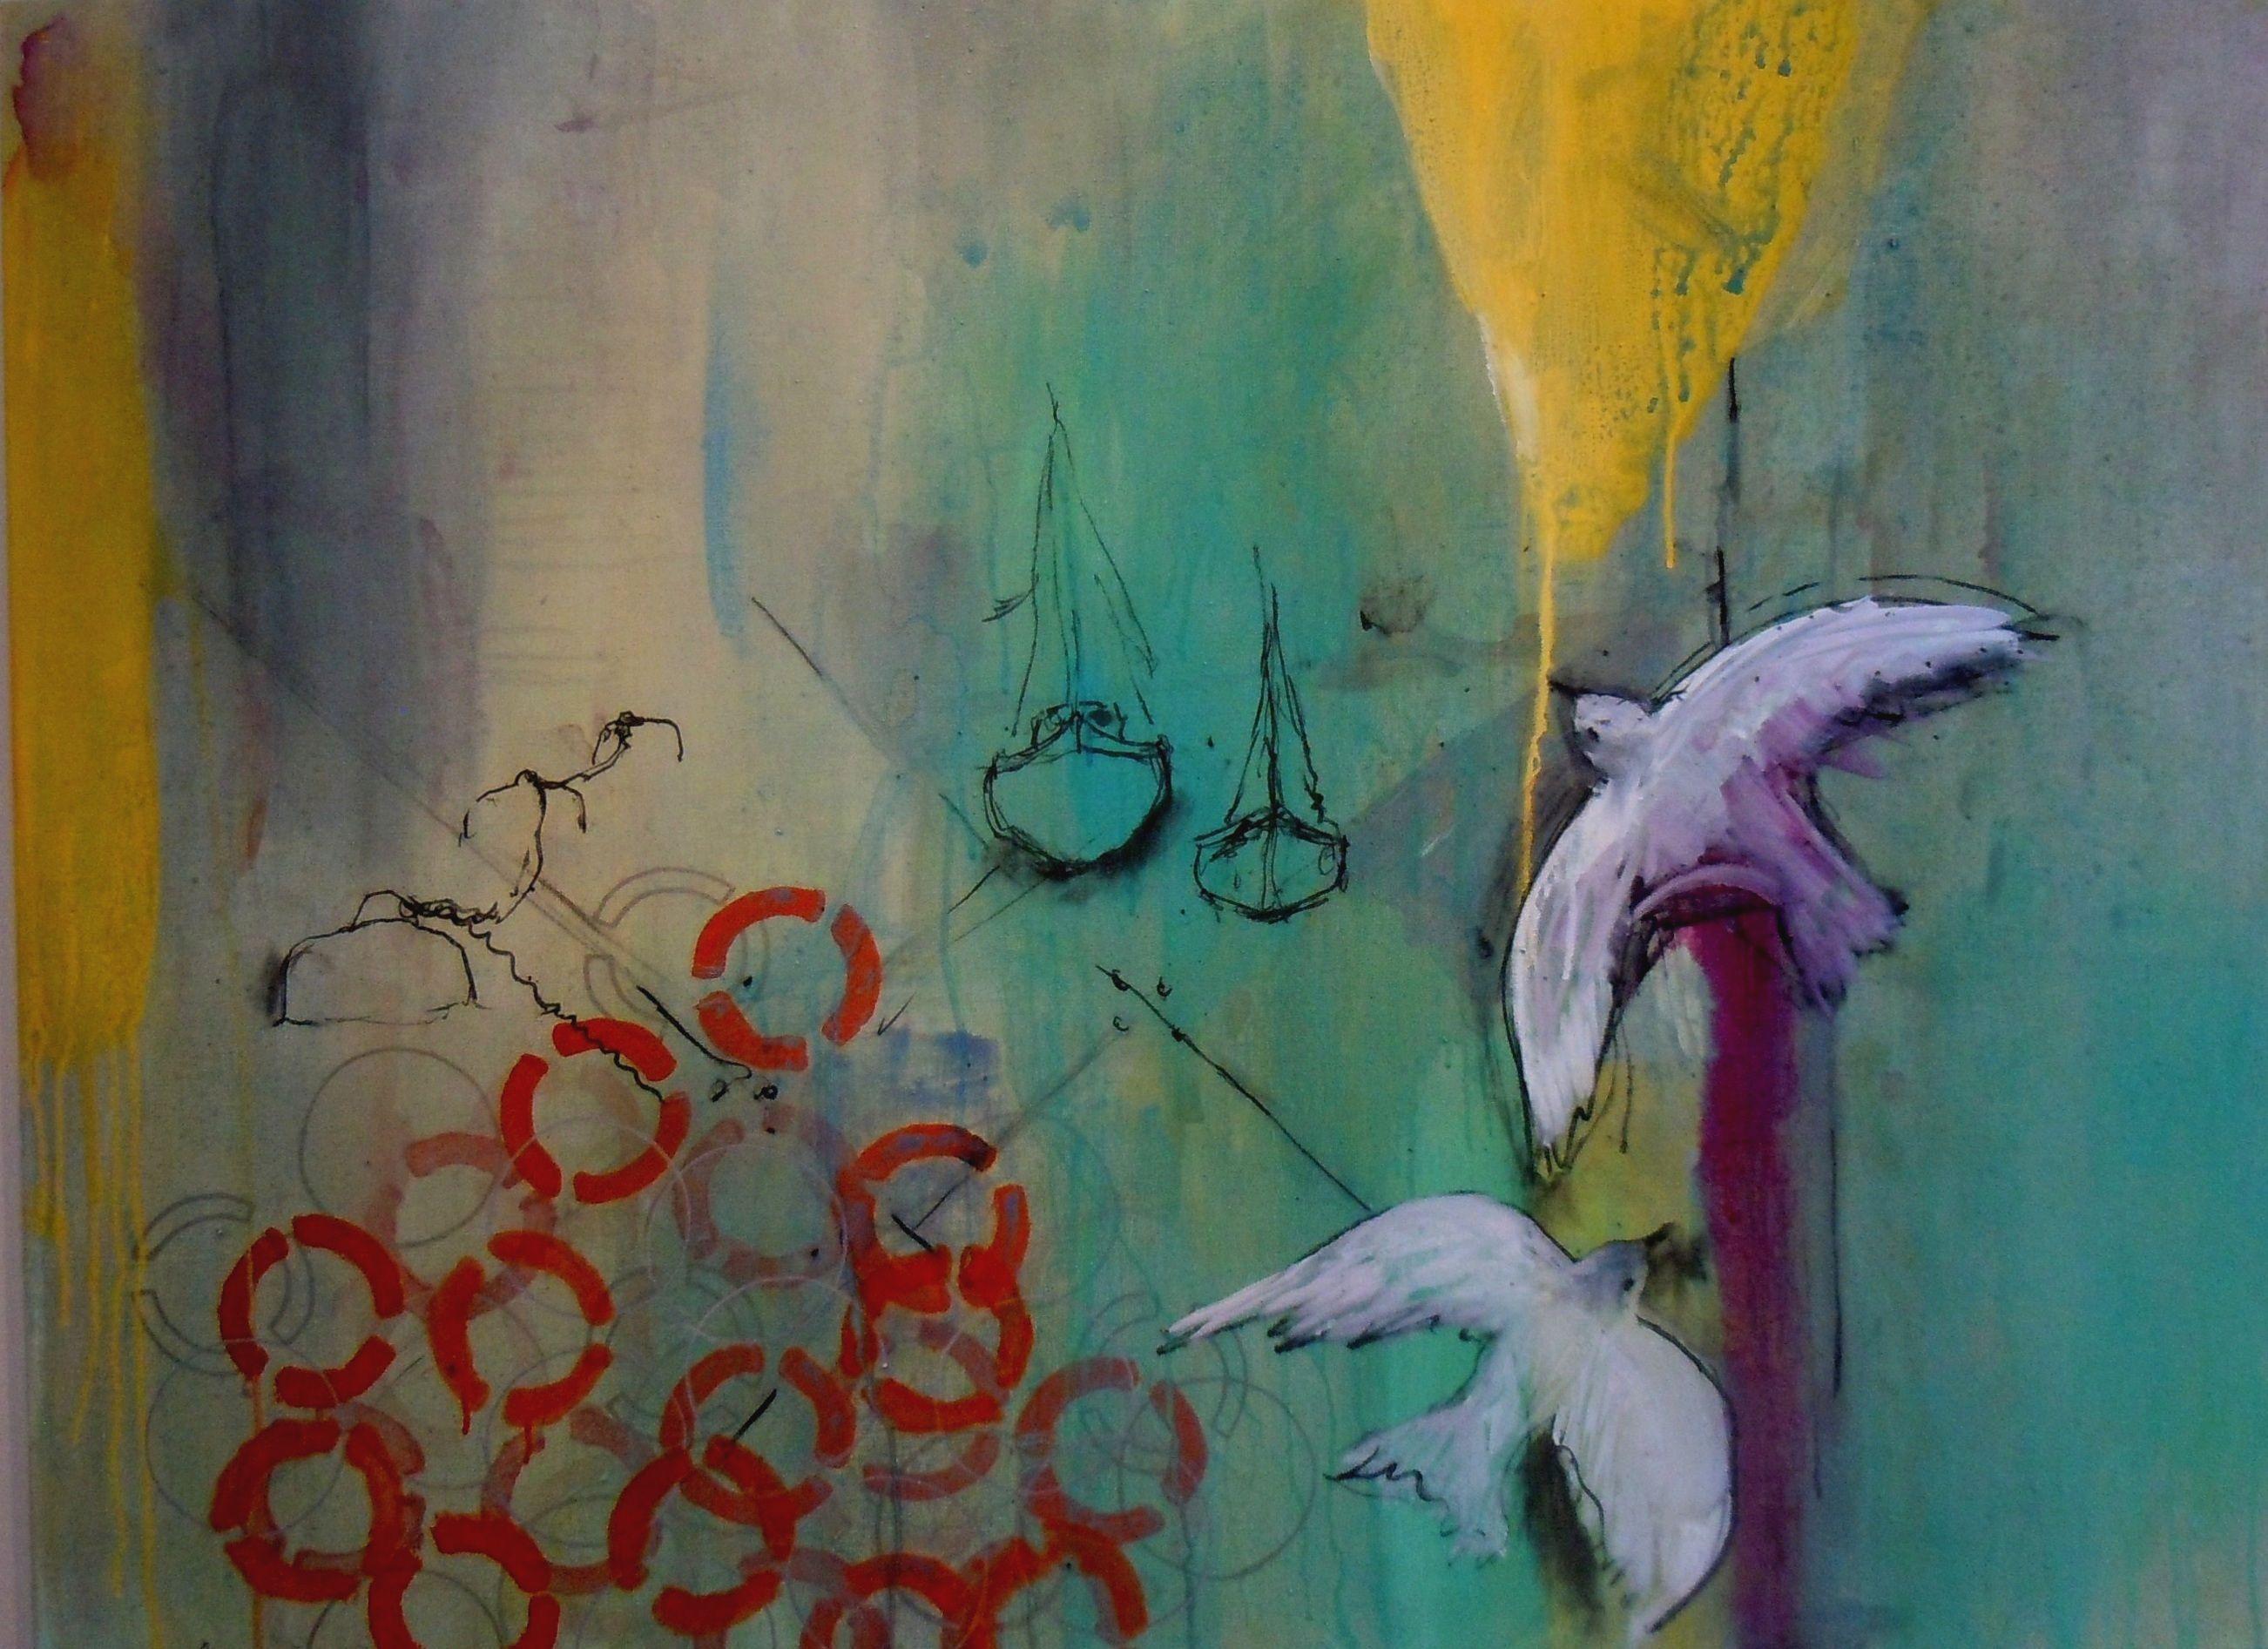 Gathering Momentum, Sun Pier, Painting, Acrylic on Canvas